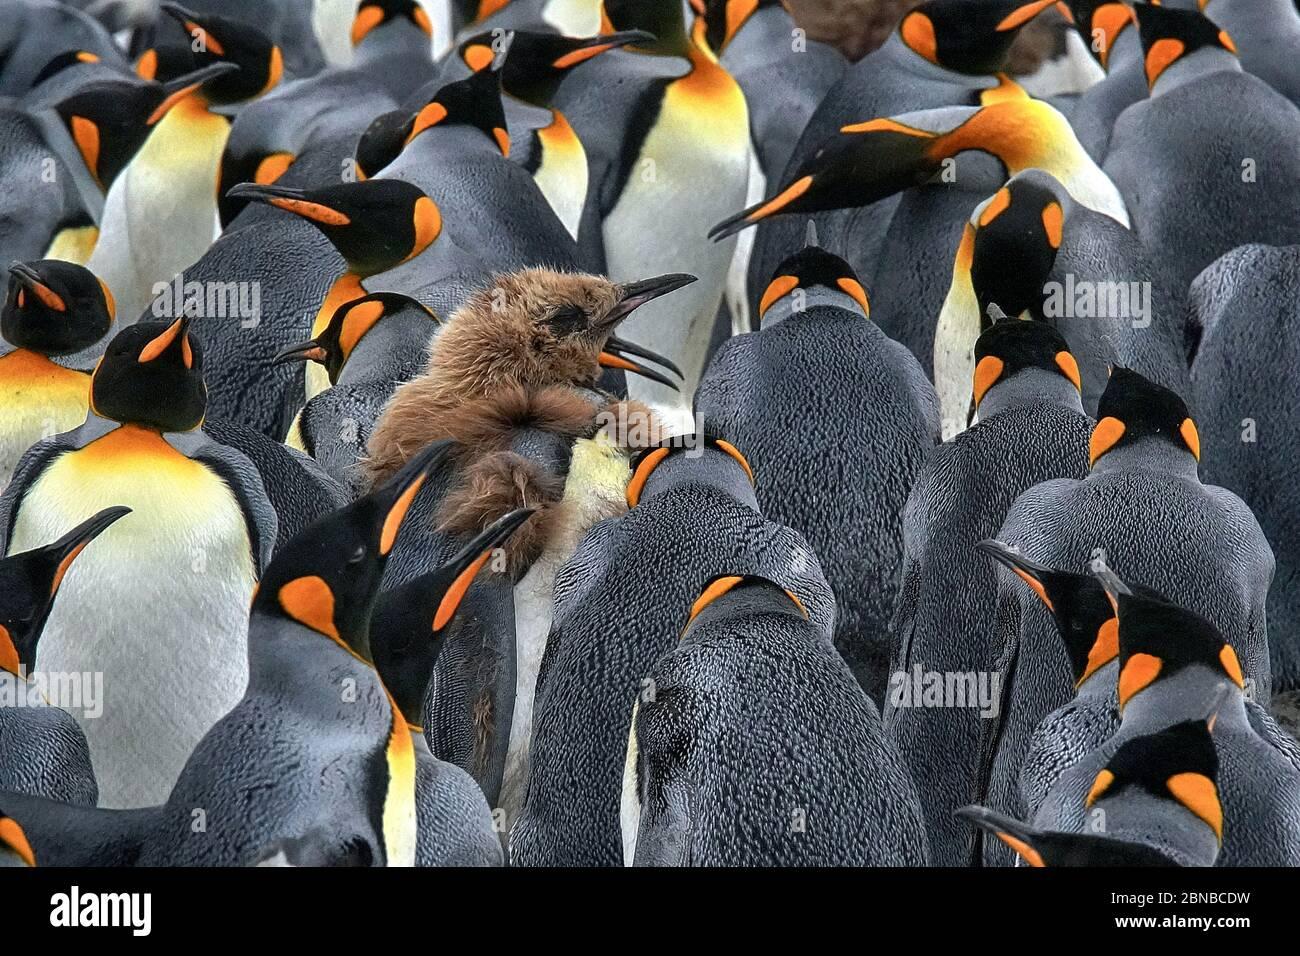 king penguin (Aptenodytes patagonicus), colony, Antarctica, Salisbury Plains, Cierva Cove Stock Photo